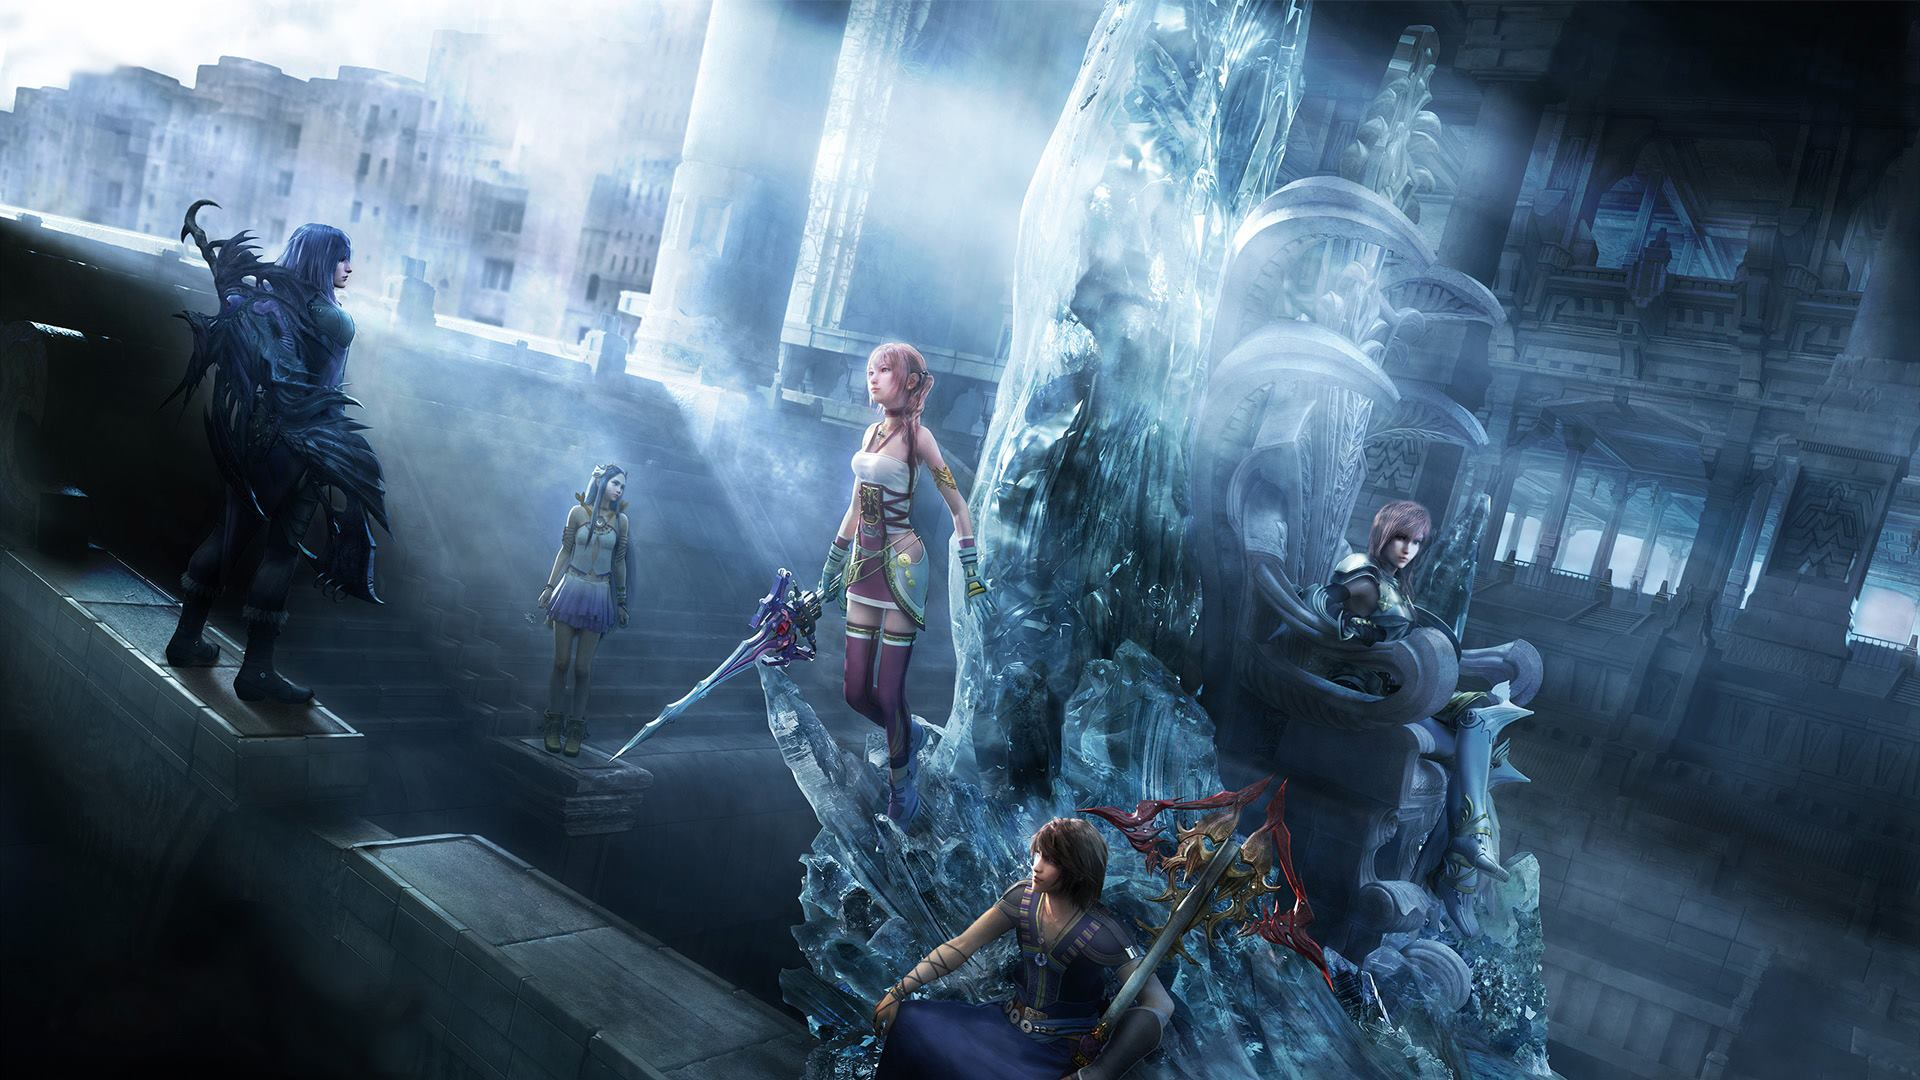 Lightning Returns Final Fantasy XIII-We must save Vanille - YouTube